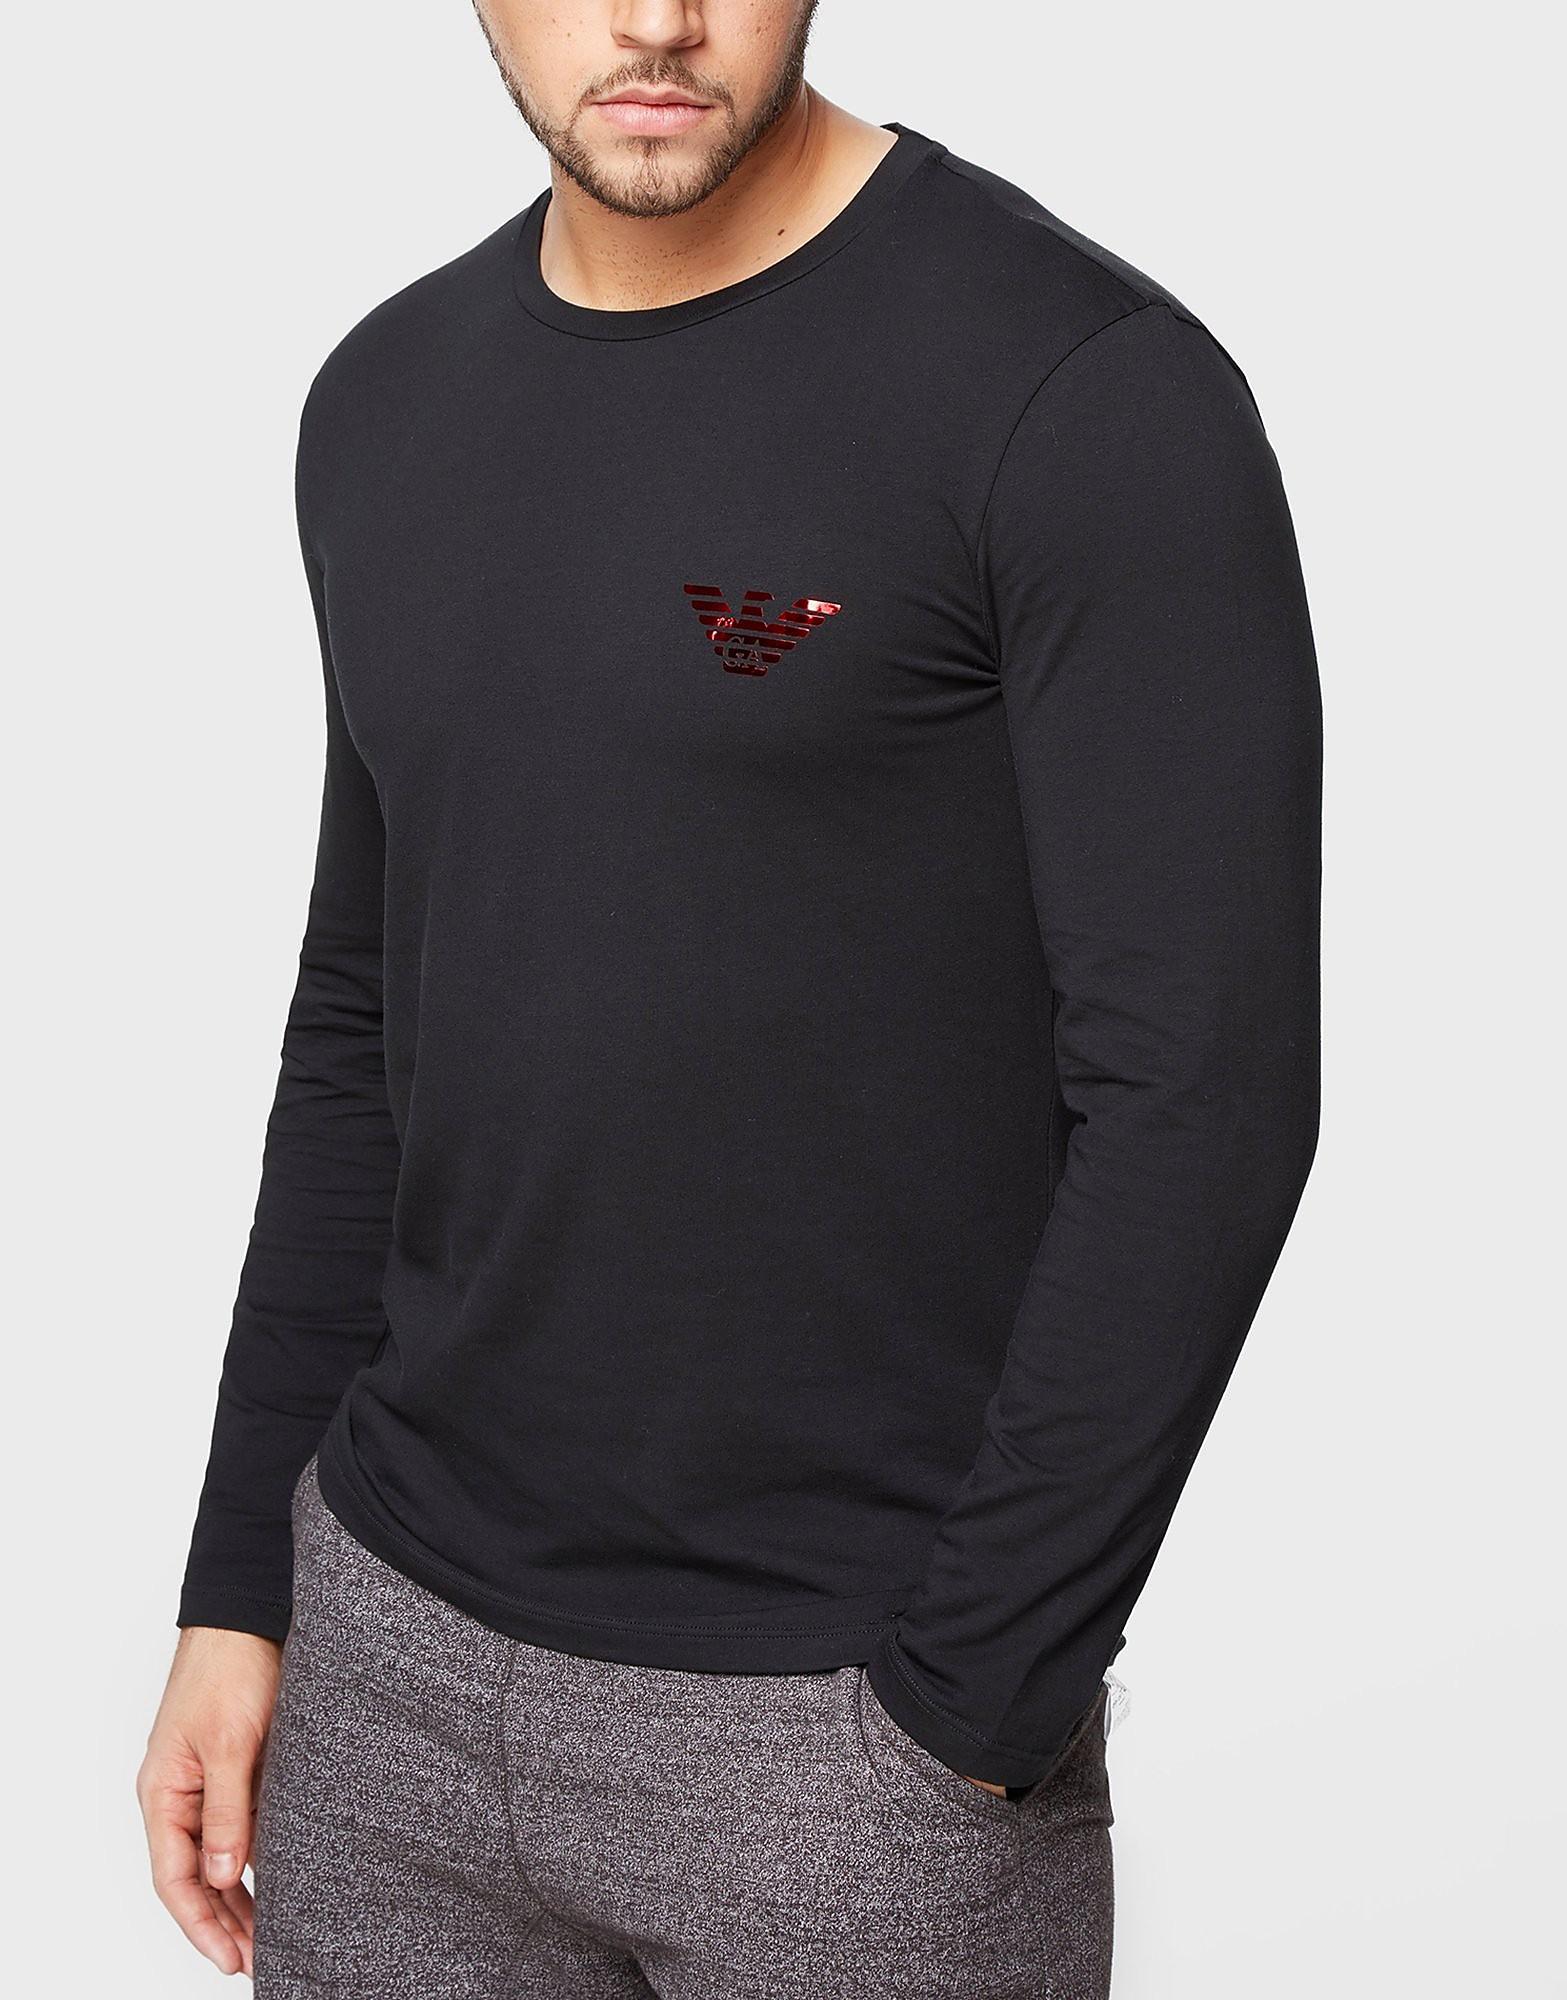 Emporio Armani Shine Eagle Long Sleeve T-Shirt